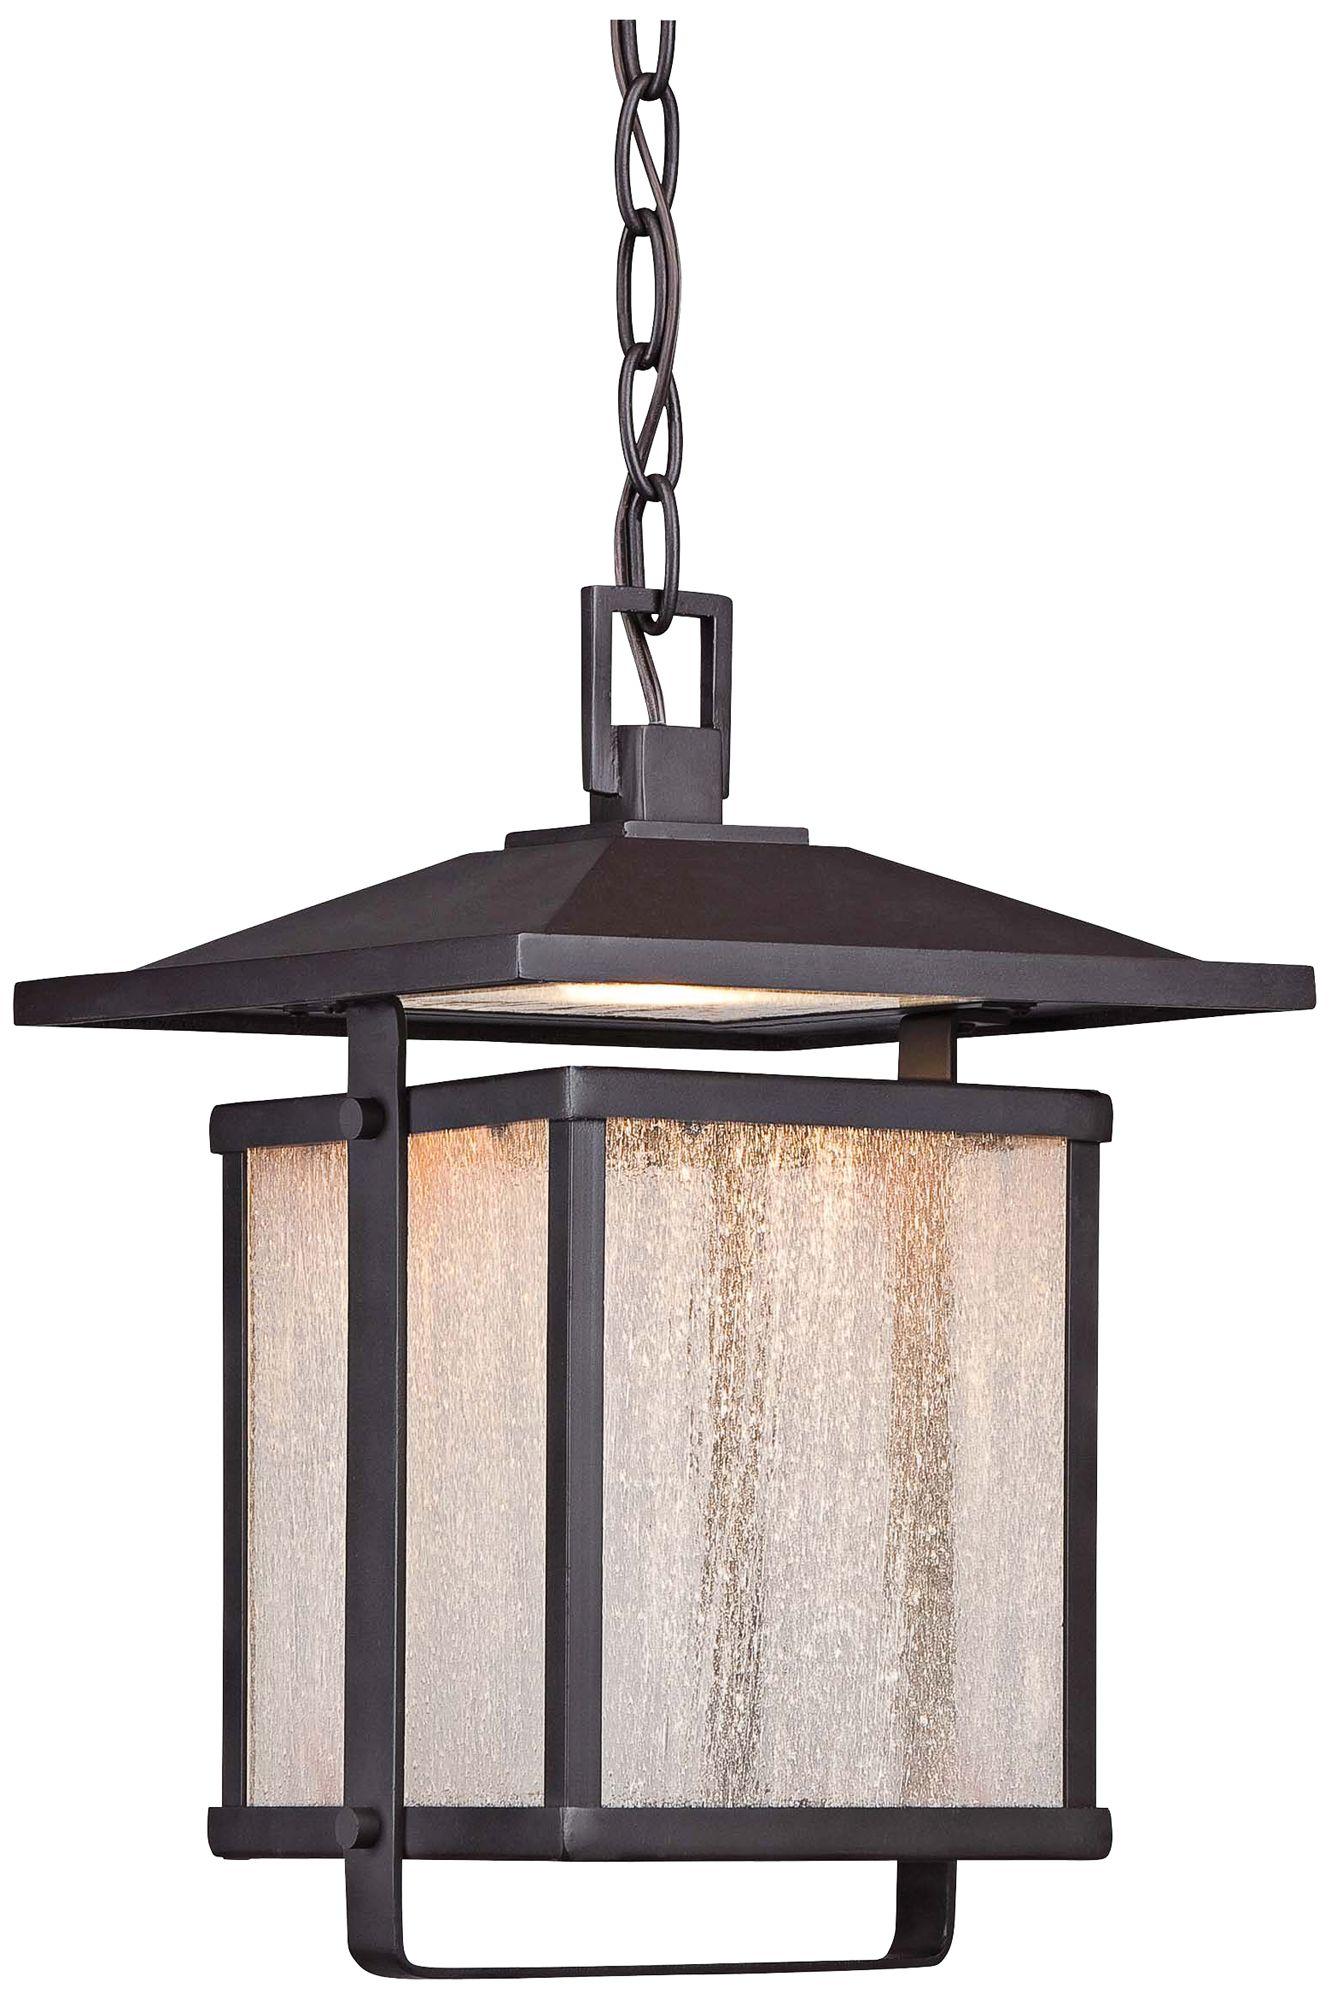 Asian style lantern